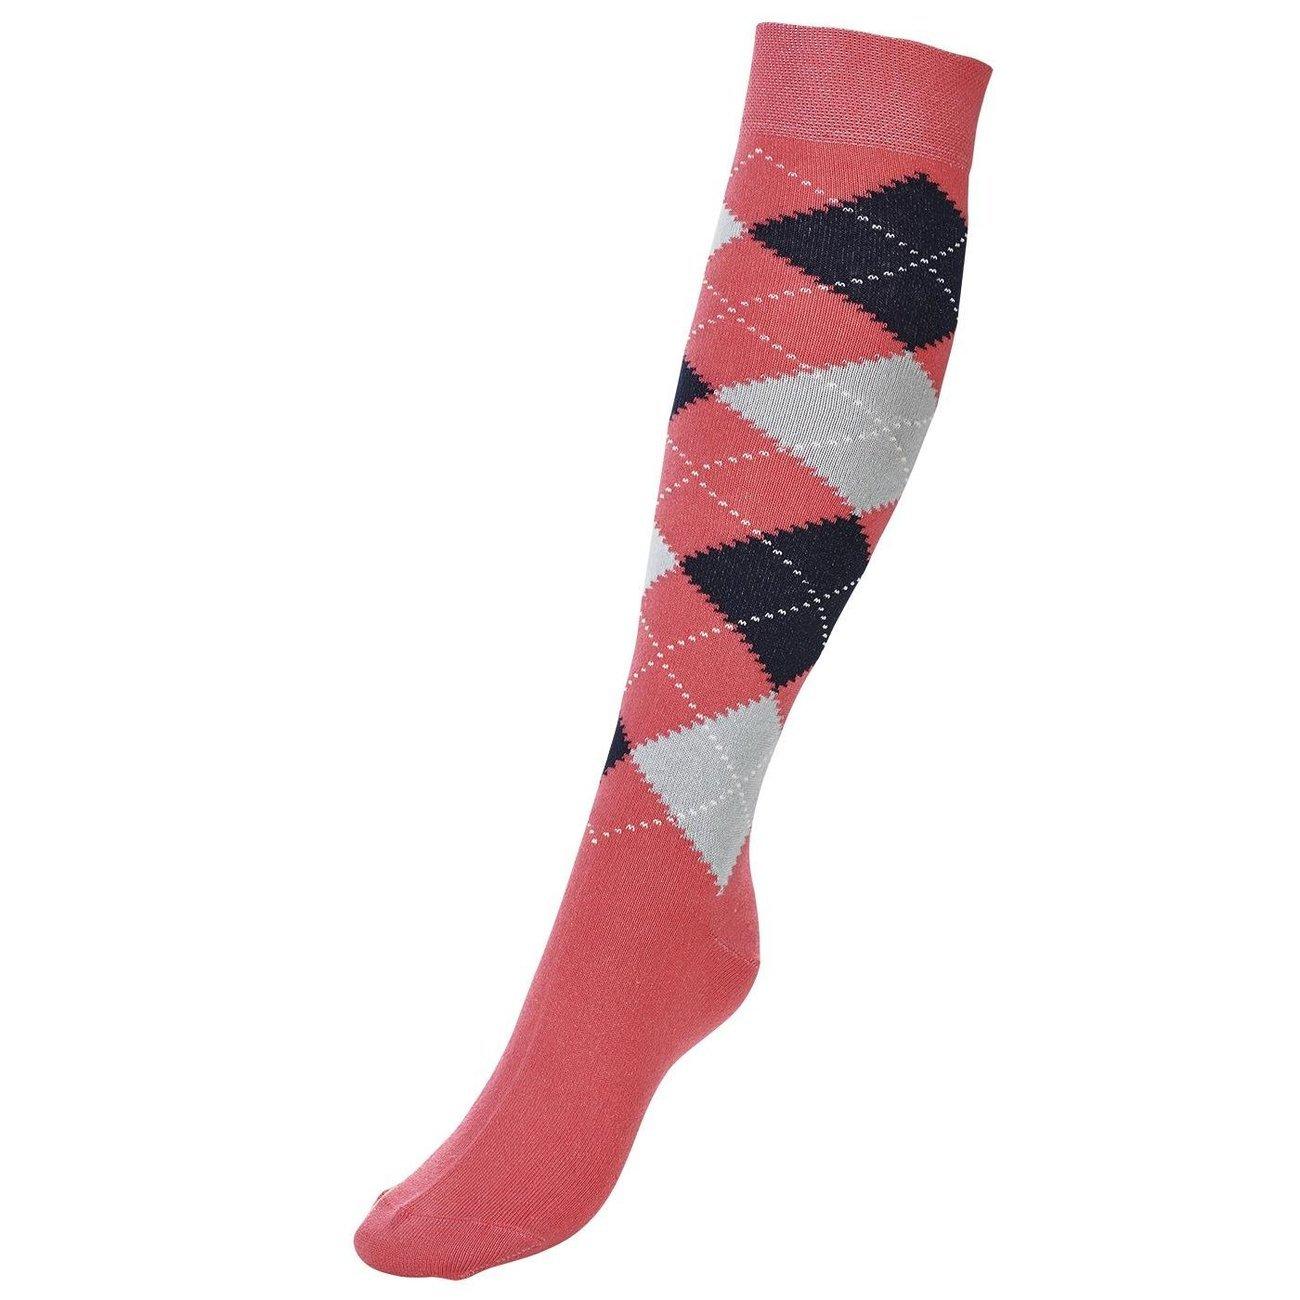 BUSSE Socken Basic Karo III, Gr. 39-42, coral/grey/black